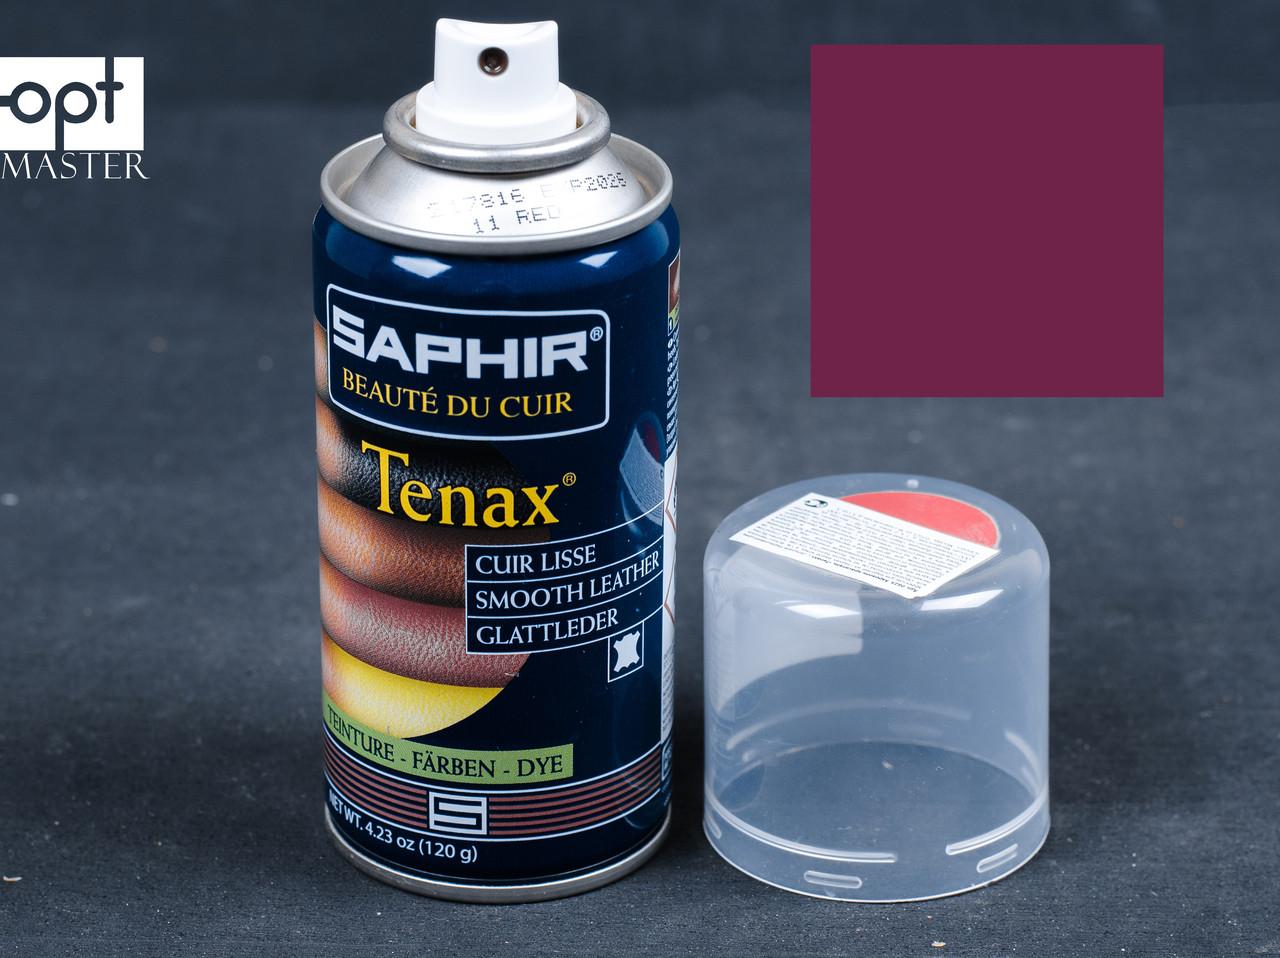 Аэрозольная краска цв.лаванда для гладкой кожи Saphir Tenax Spray, 150 мл,(0823)(48)